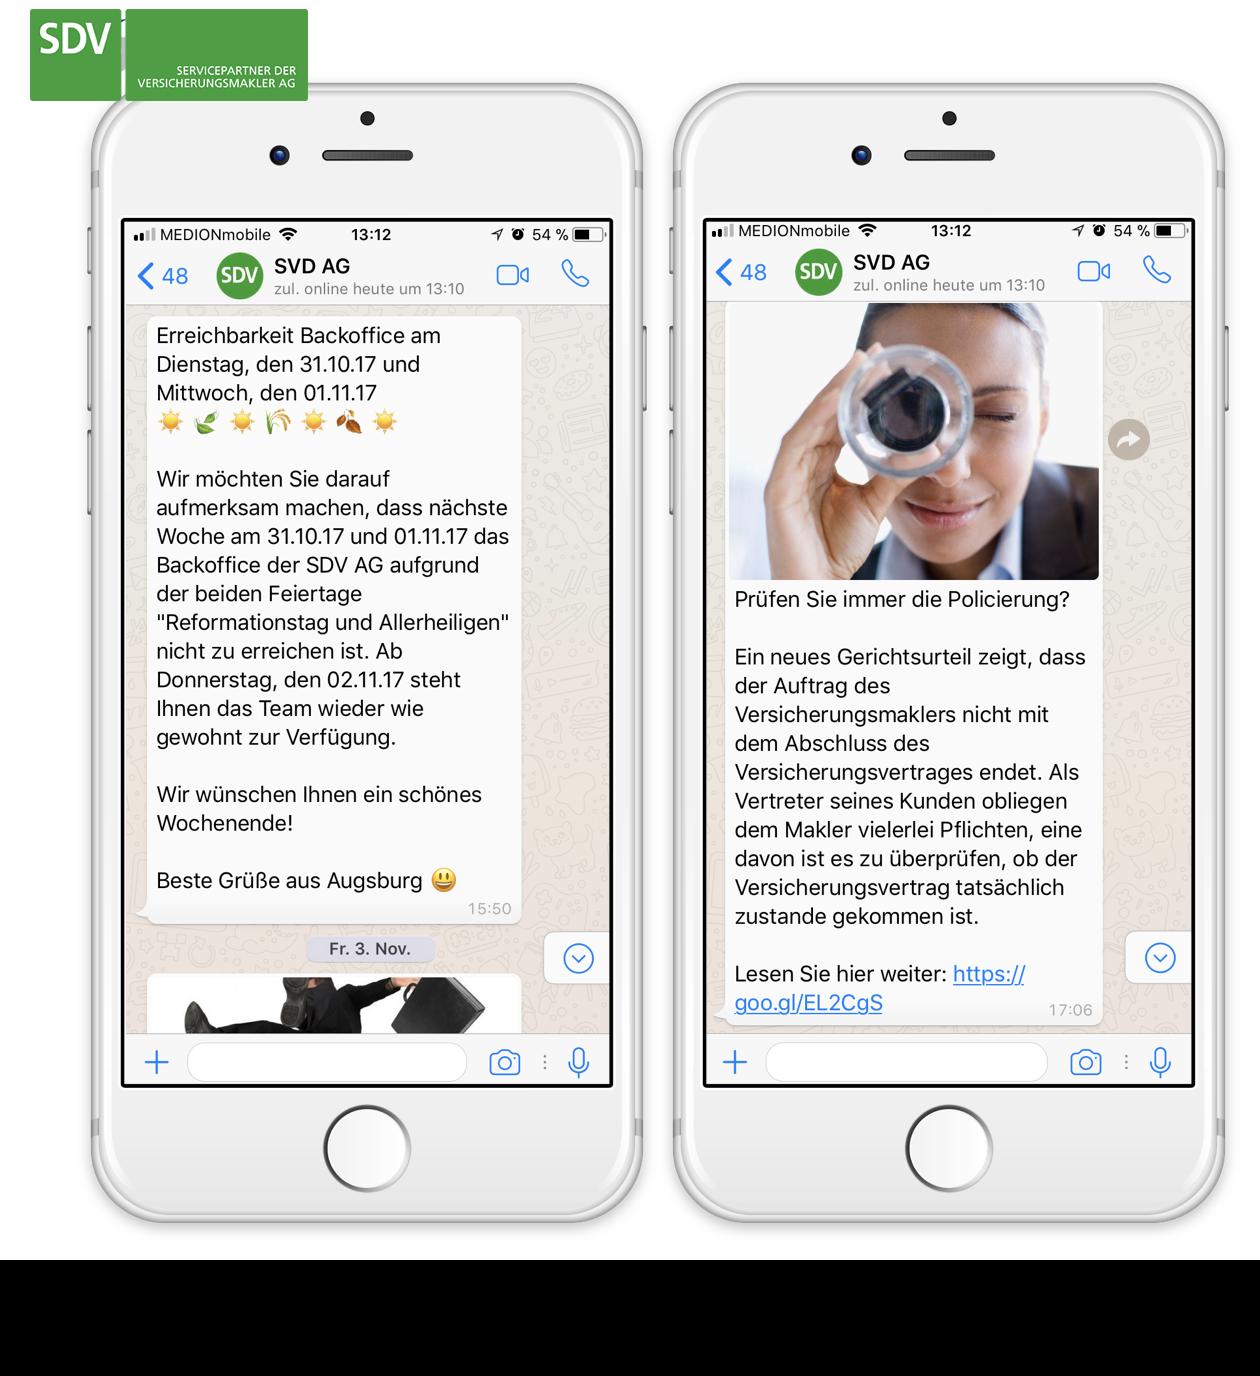 B2B-und-WhatsApp-SDV